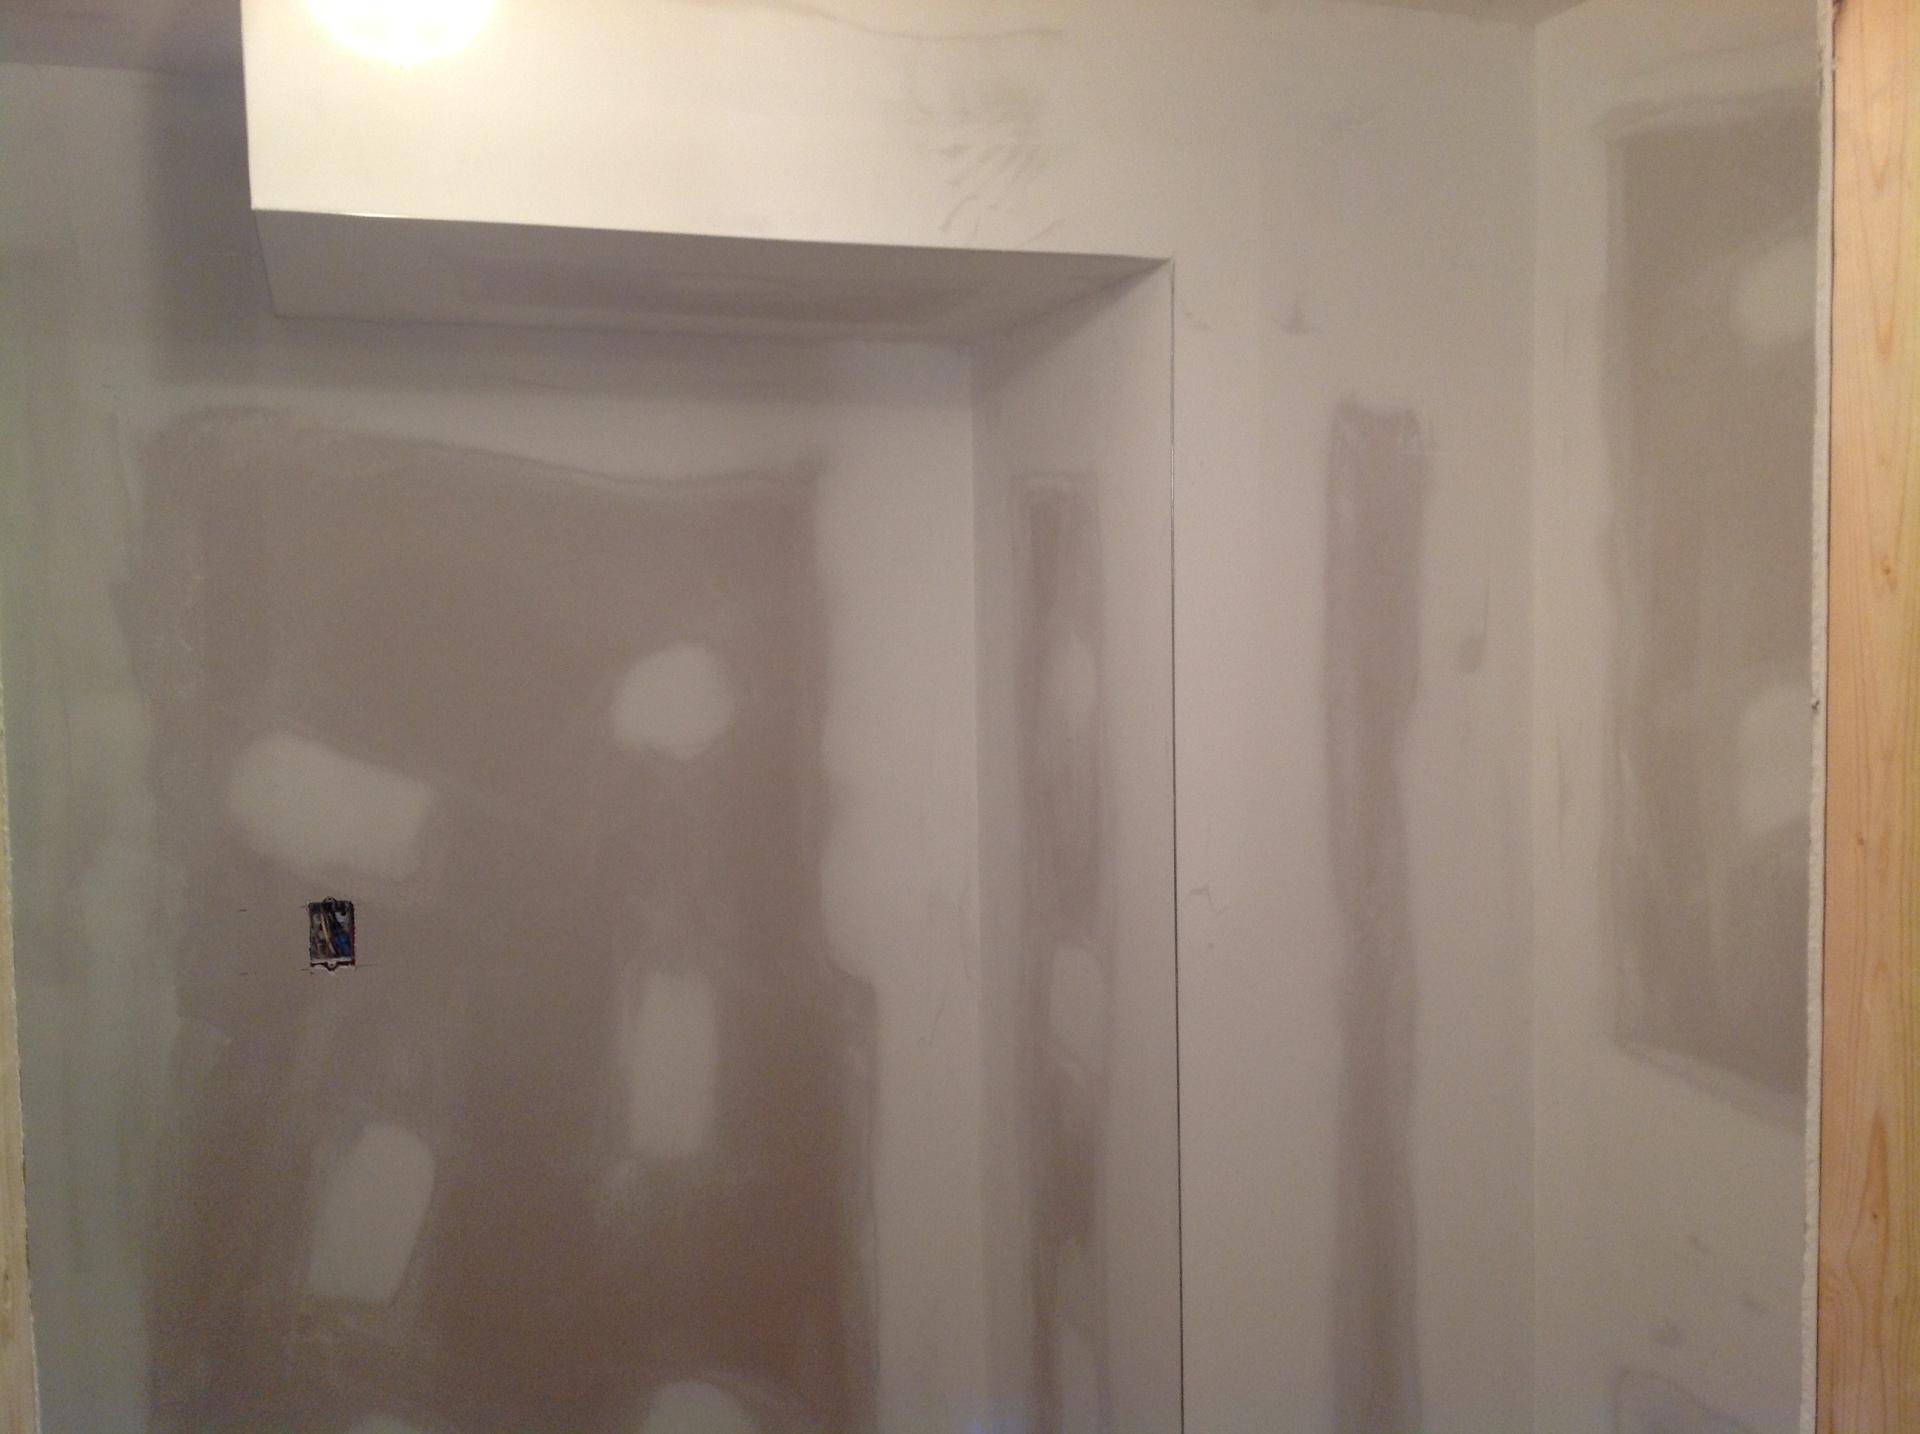 Plastered Drywall in basement